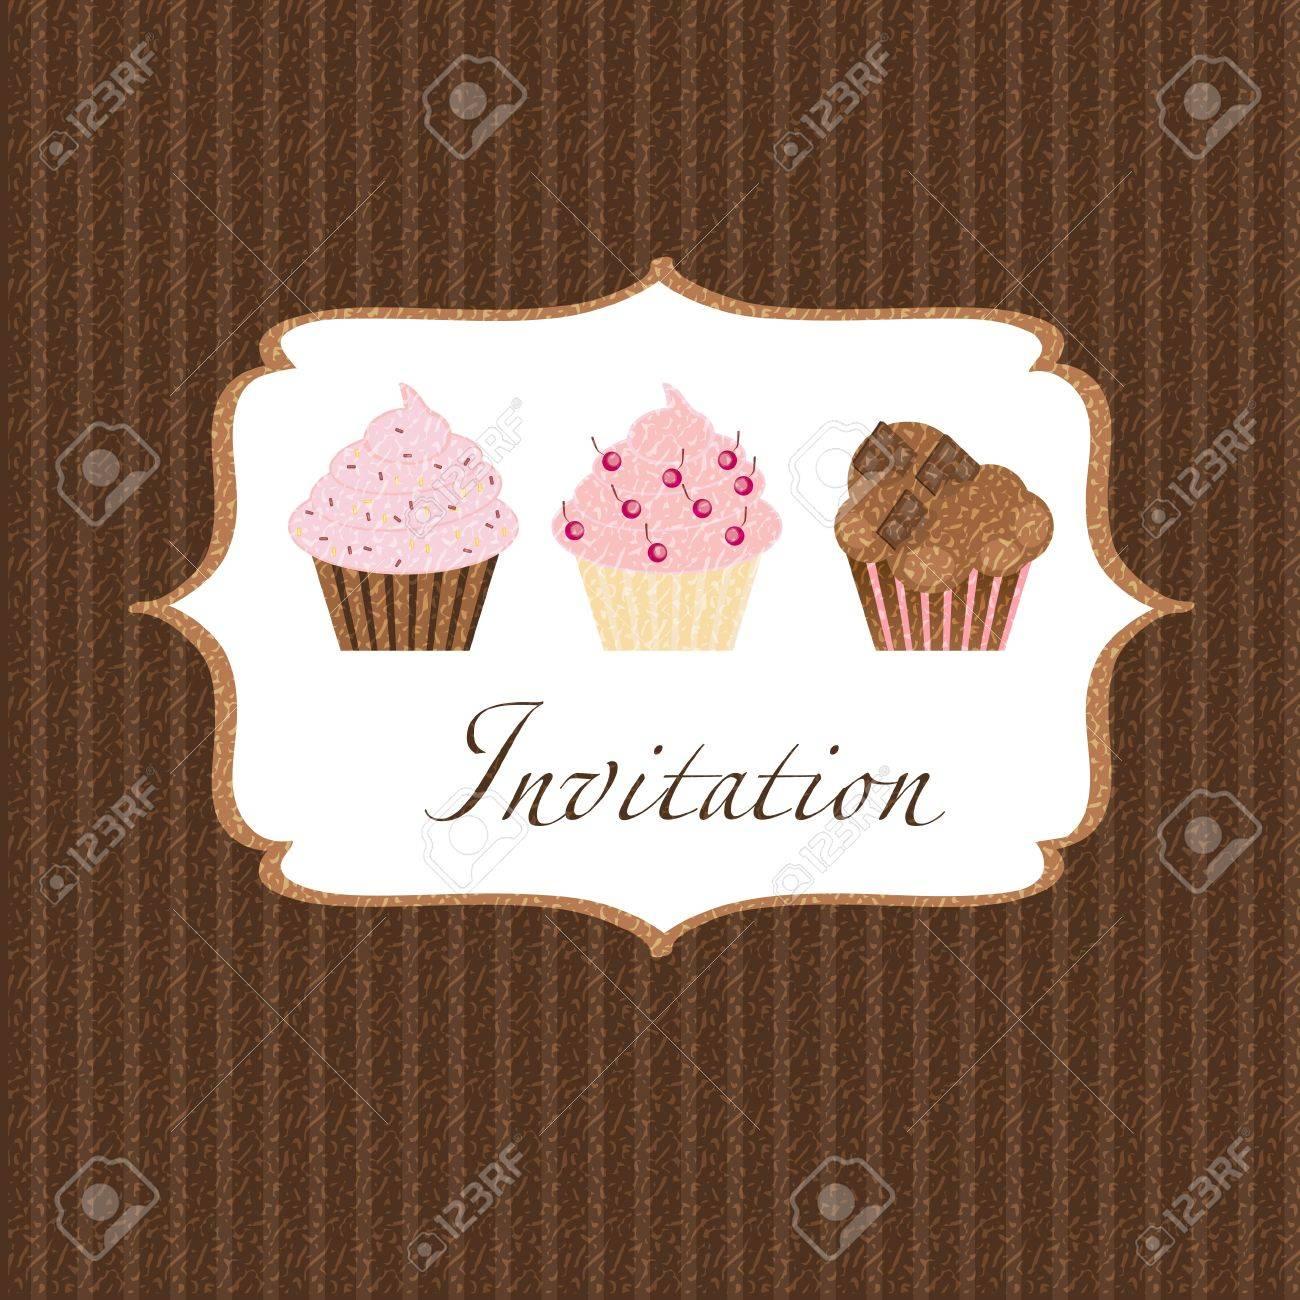 cupcake invitation background Stock Photo - 17539425